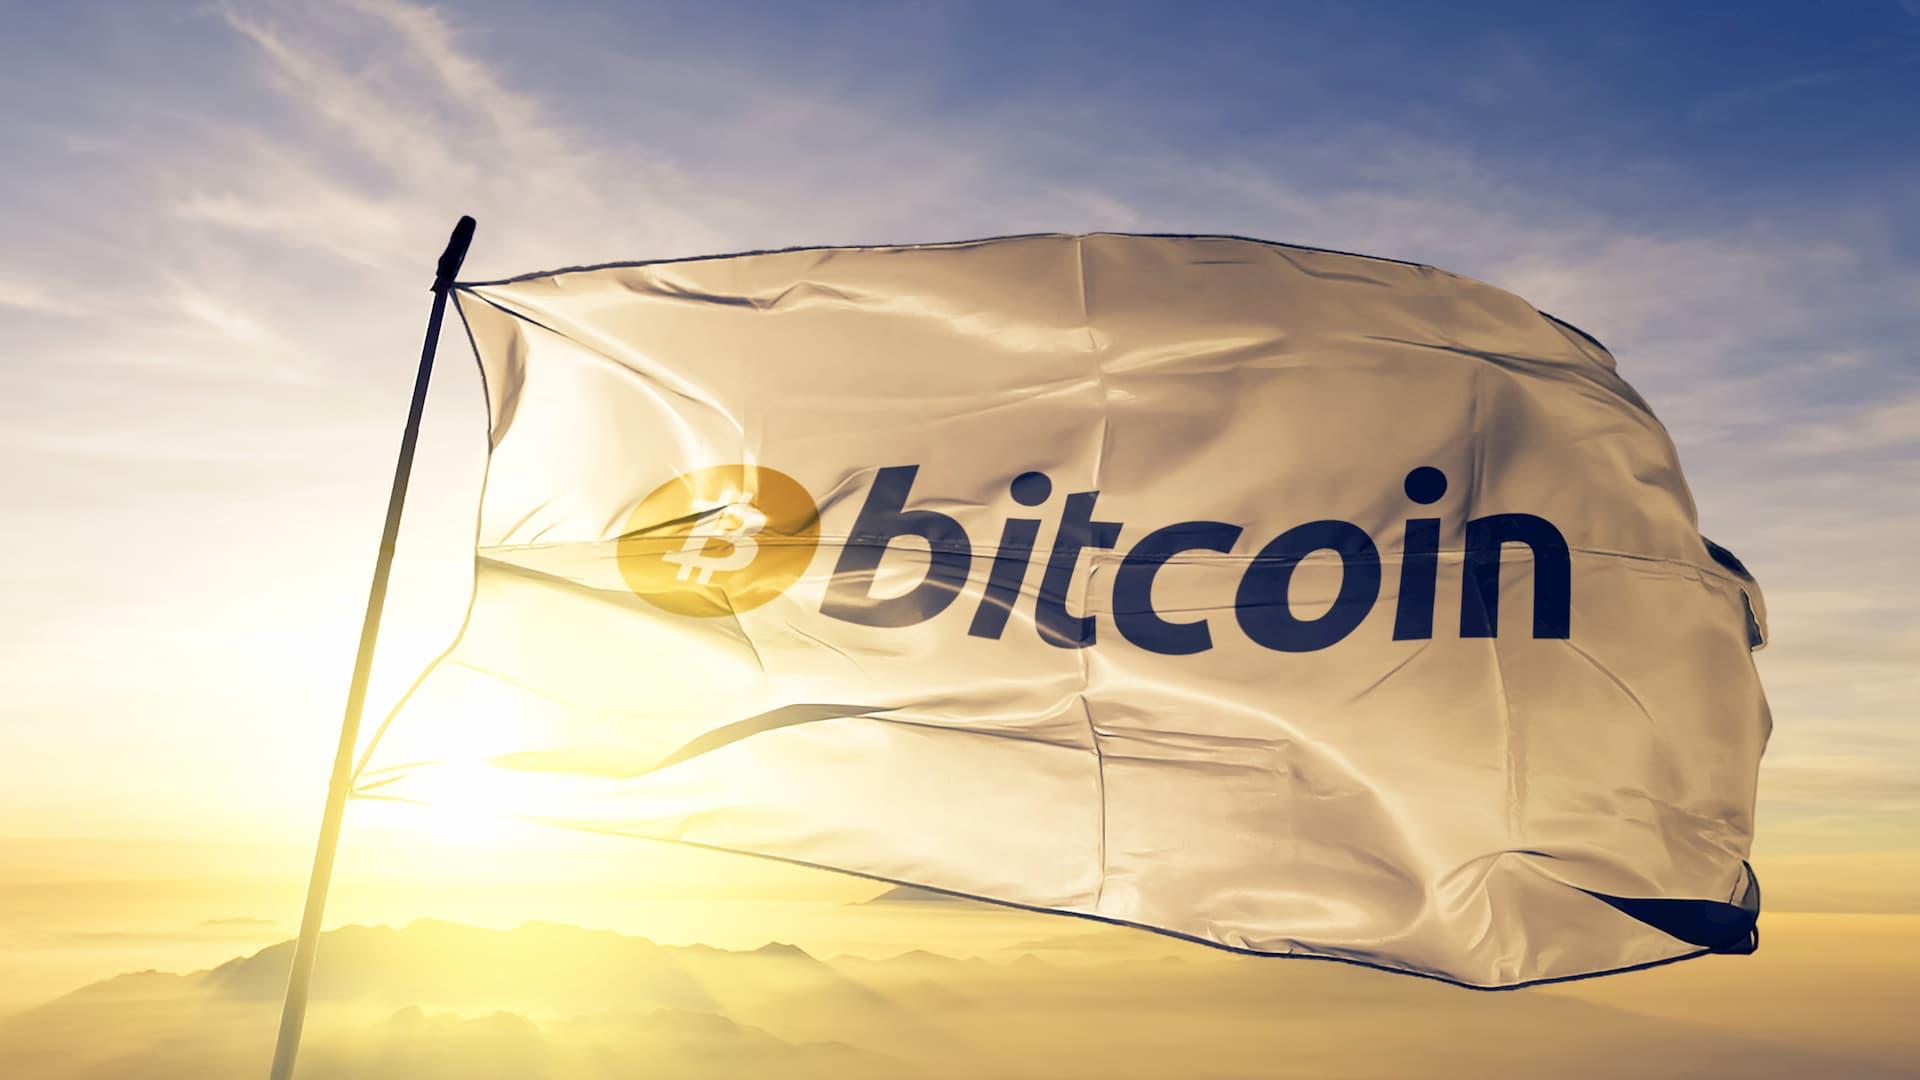 bitcoin-improves-financial-freedom-around-the-world